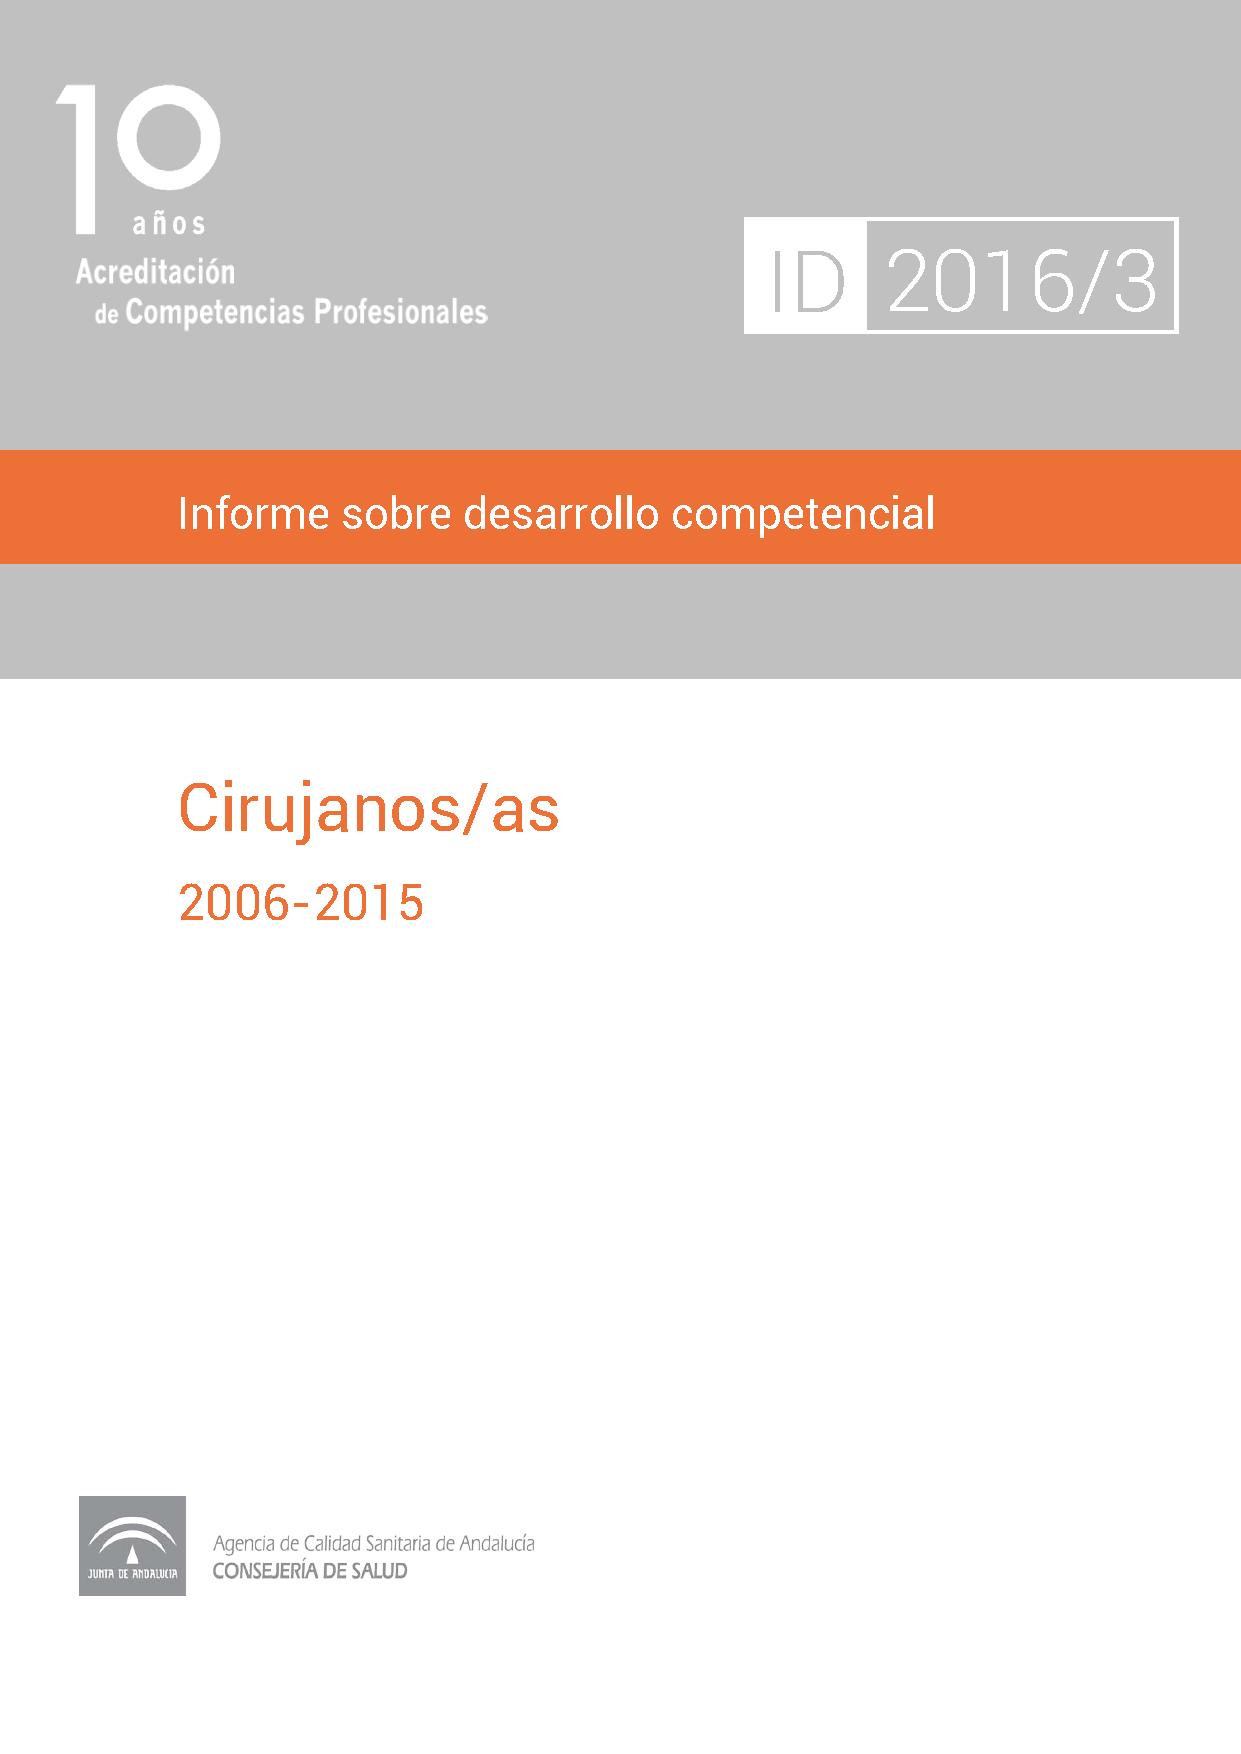 Informe sobre desarrollo competencial: Cirujanos/as